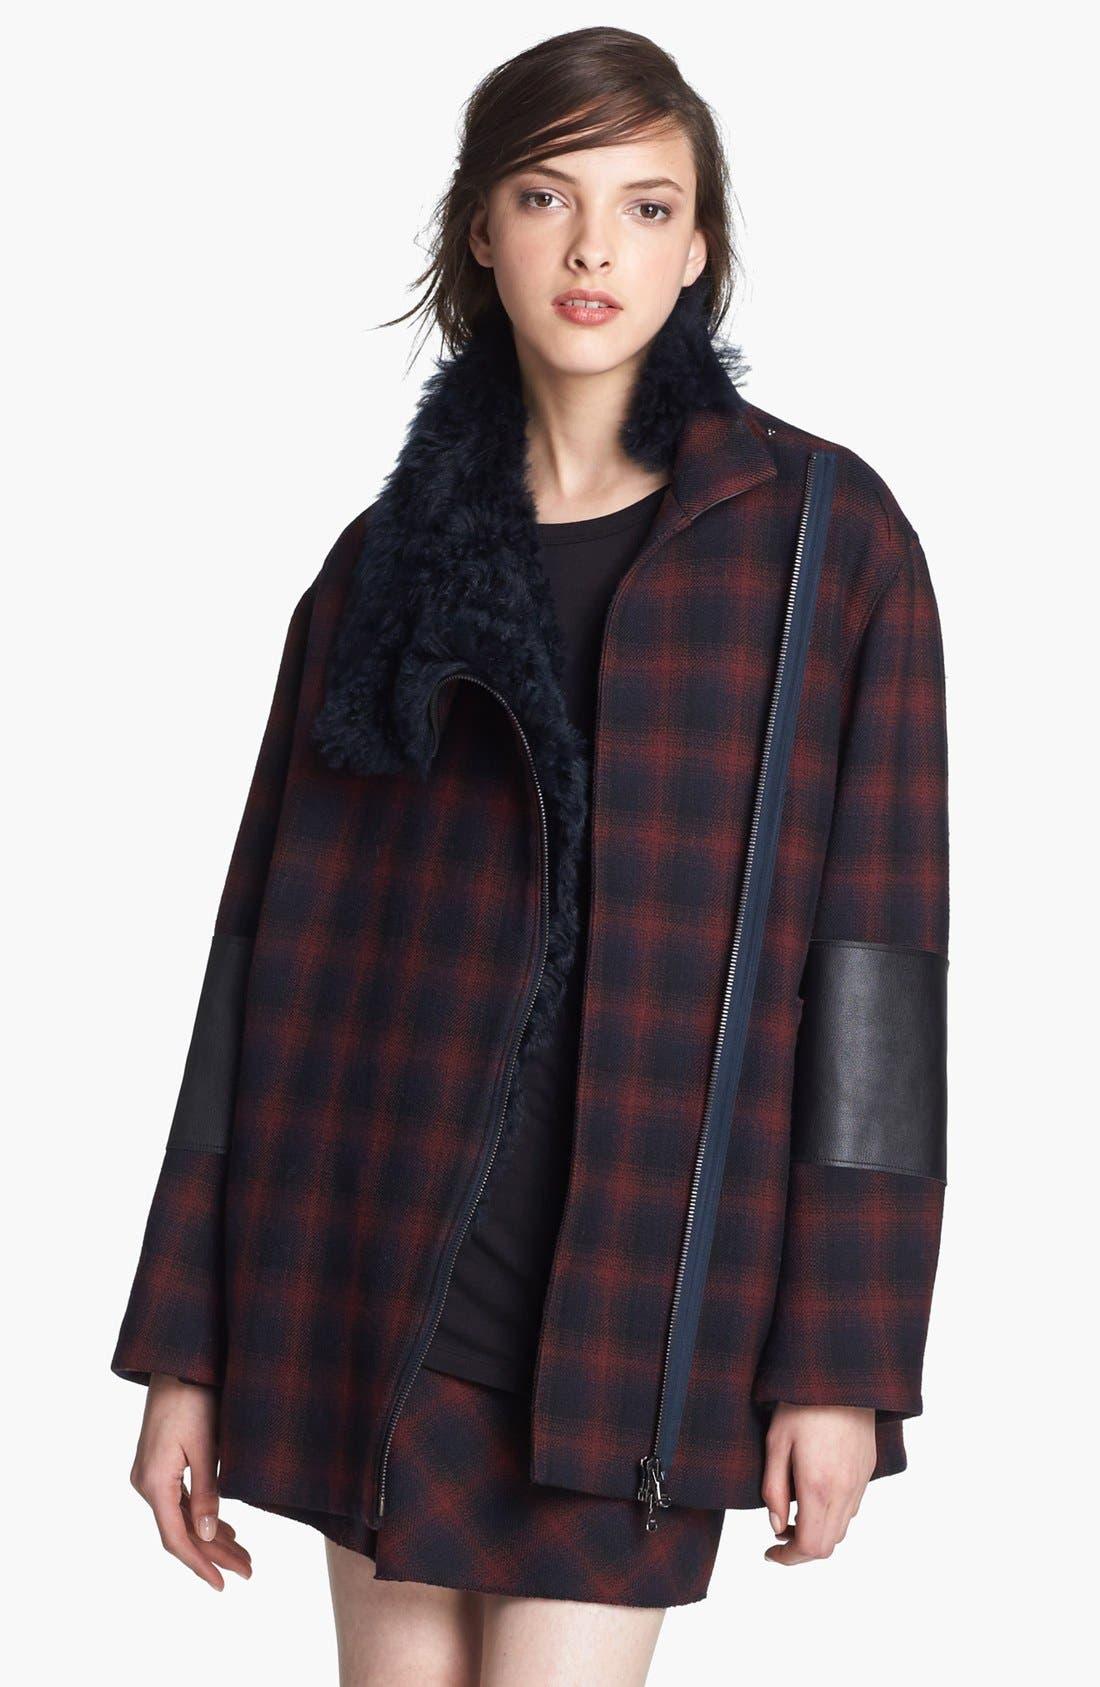 Alternate Image 1 Selected - 3.1 Phillip Lim Plaid Jacket with Genuine Lamb Fur Trim